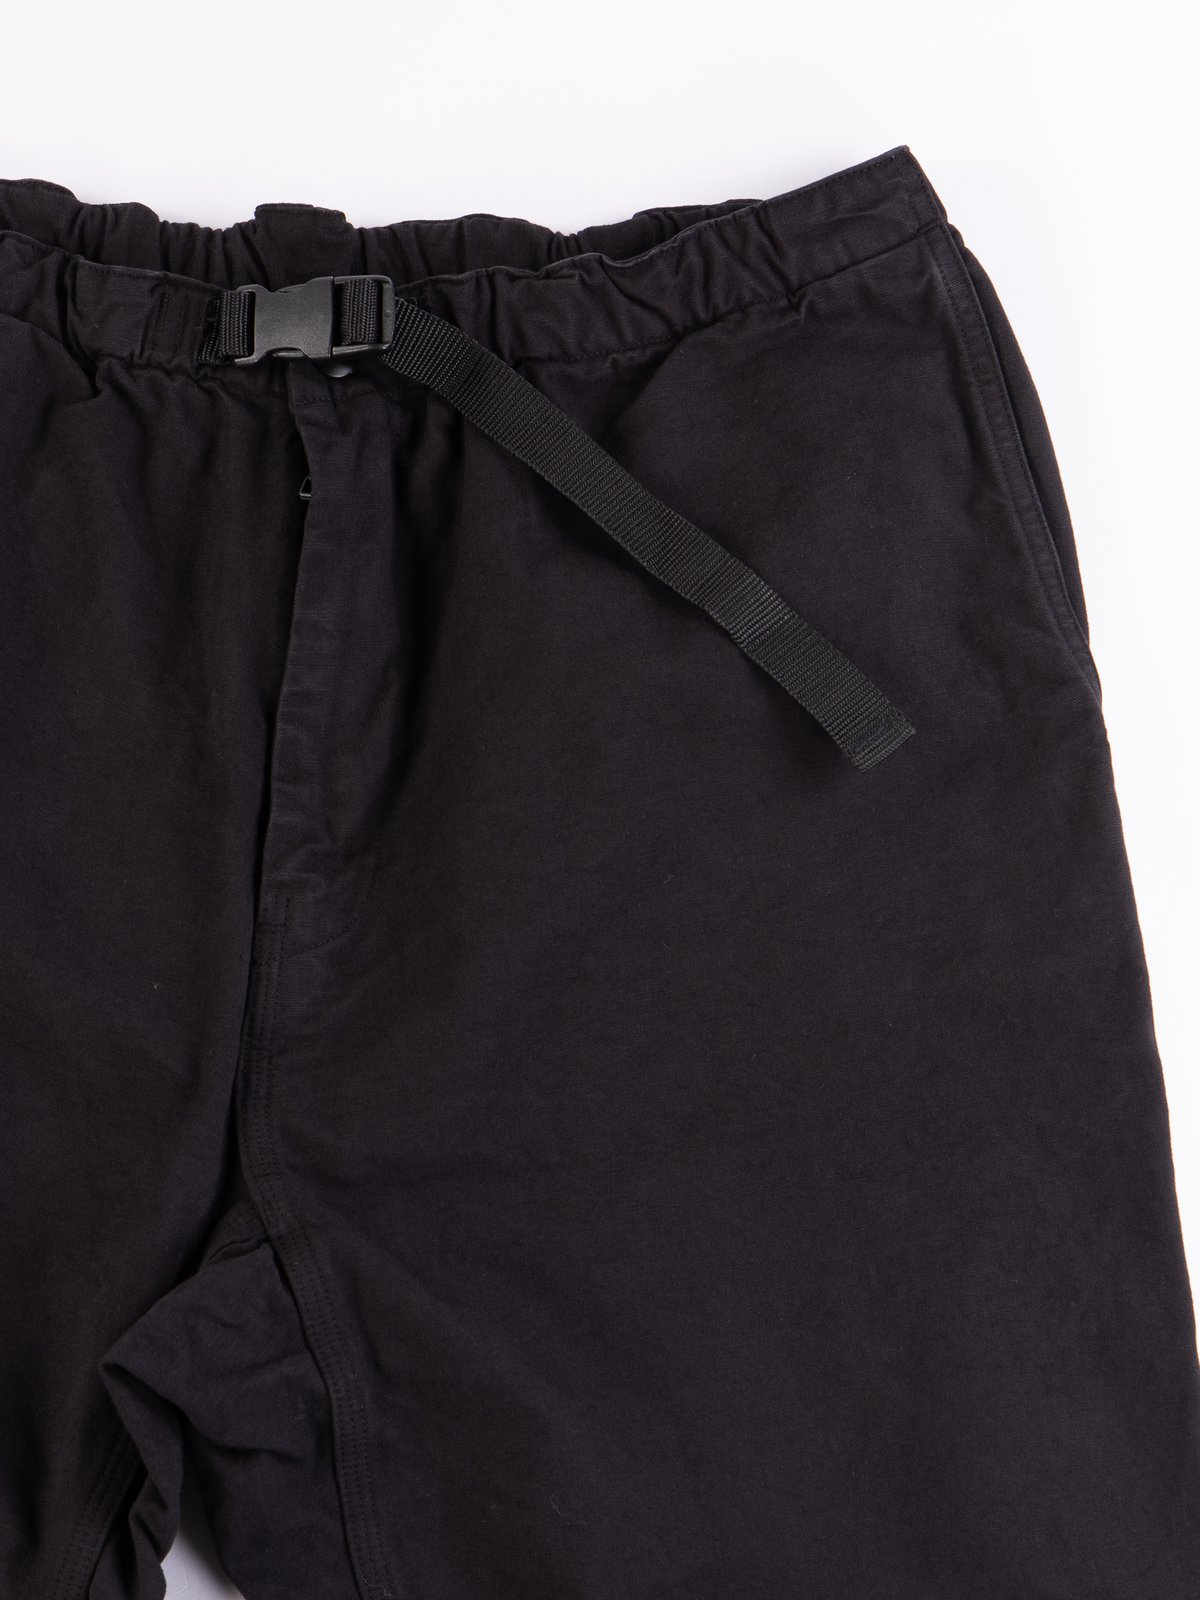 Black Overdyed Canvas TBB Climbing Pant - Image 4